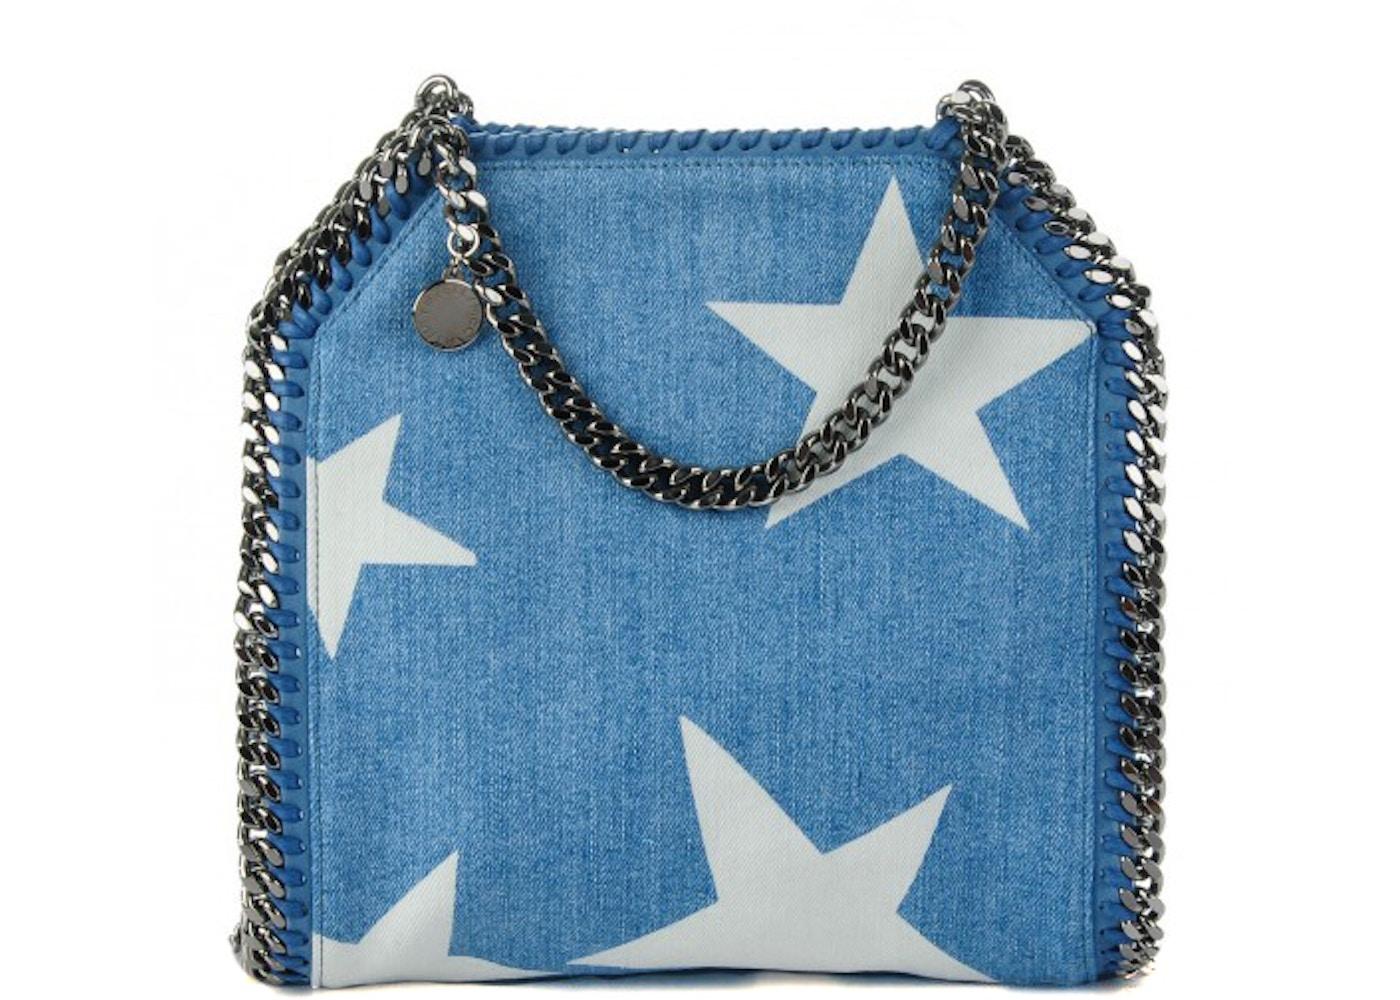 Buy   Sell Luxury Handbags 6724dff9875e4